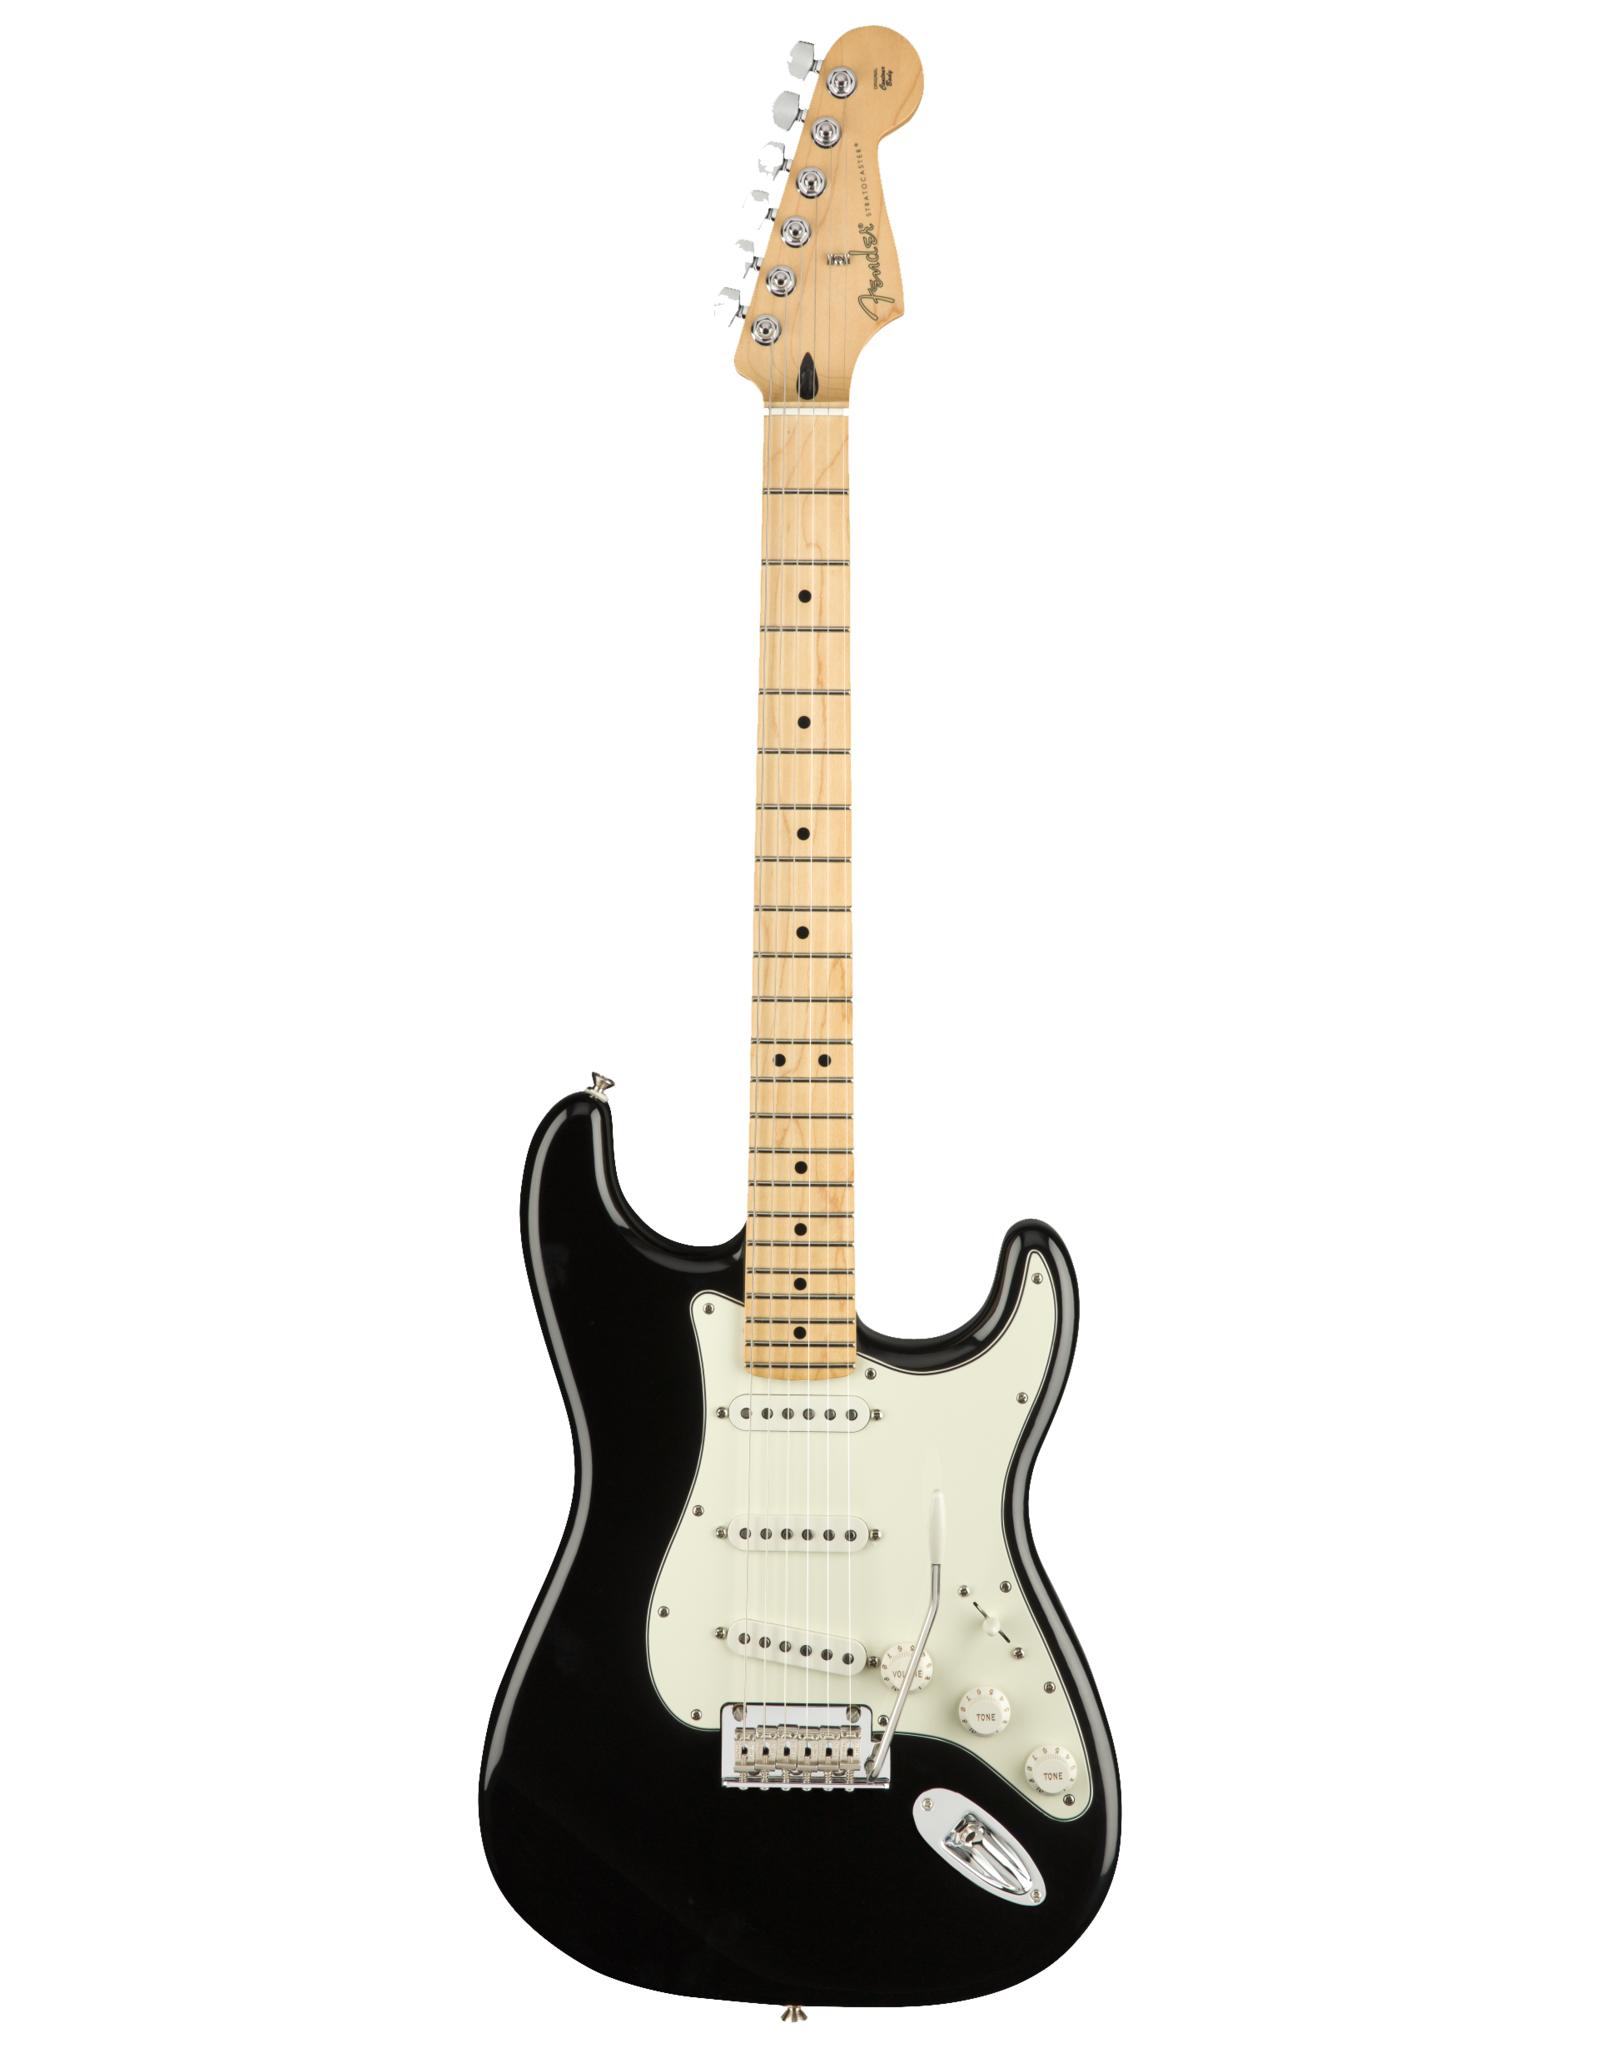 Fender Fender Player Stratocaster, Black w/Maple Fingerboard